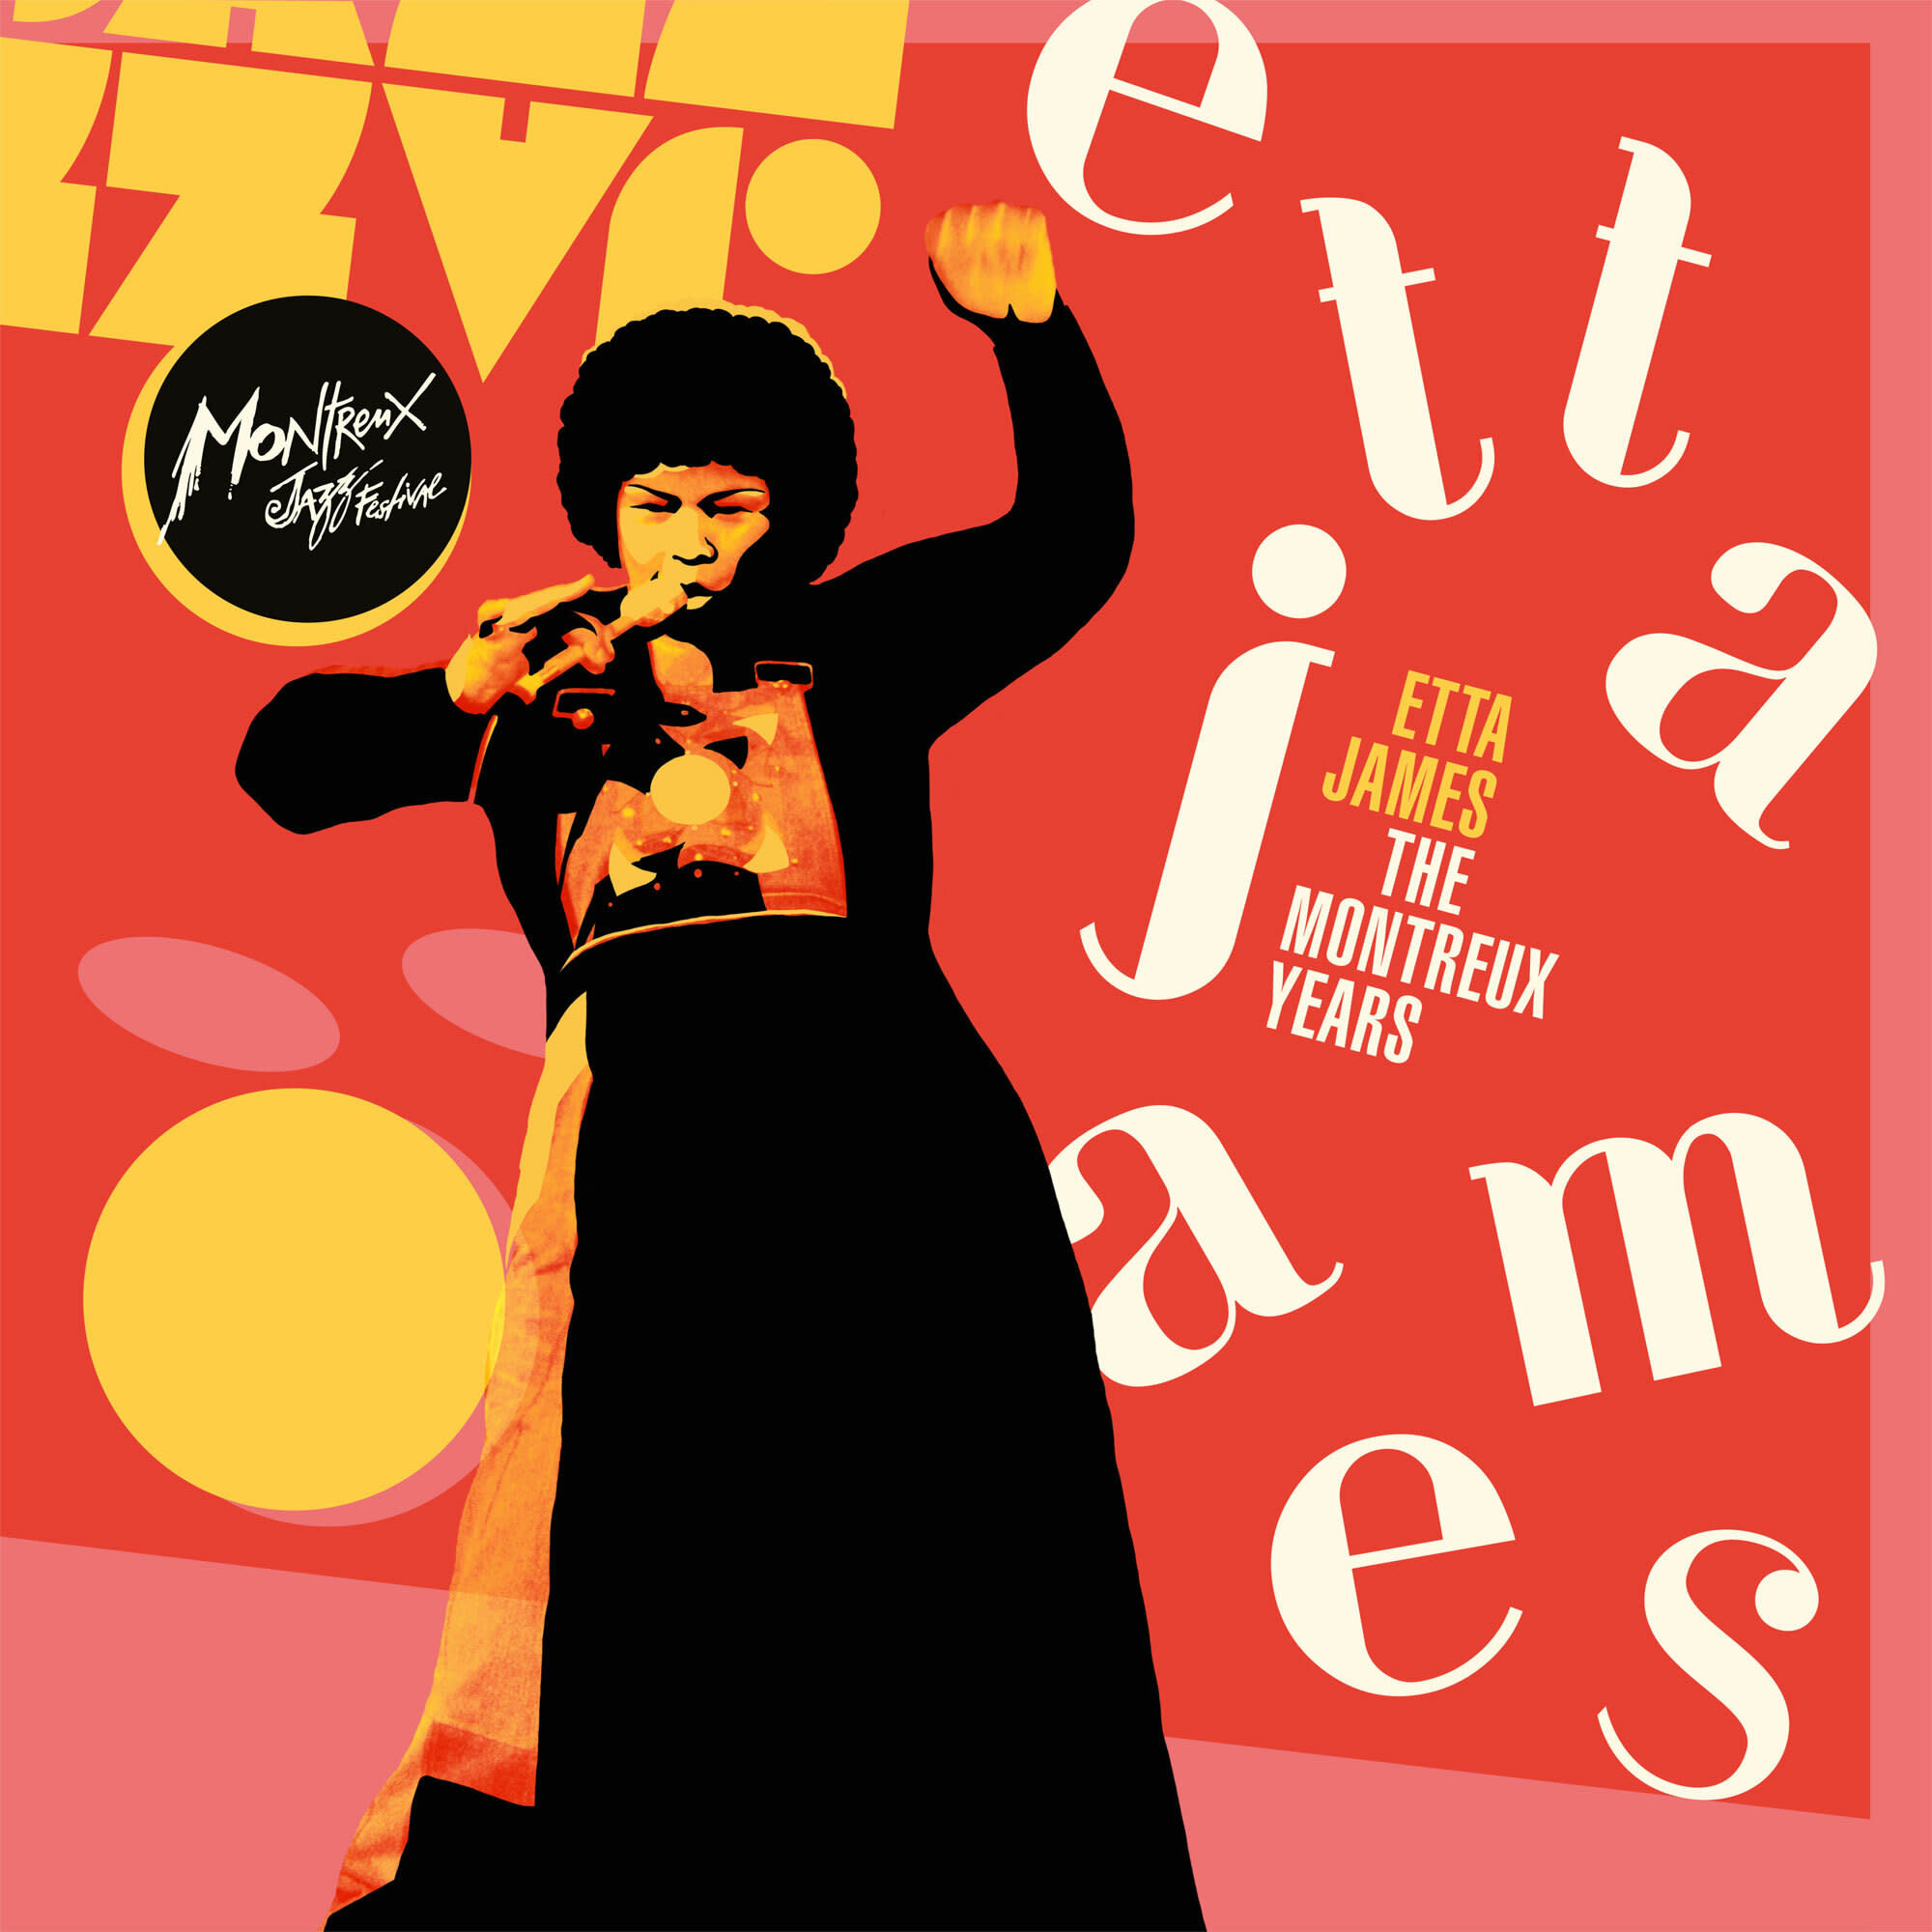 R&B/Soul/Funk Etta James - The Montreux Years